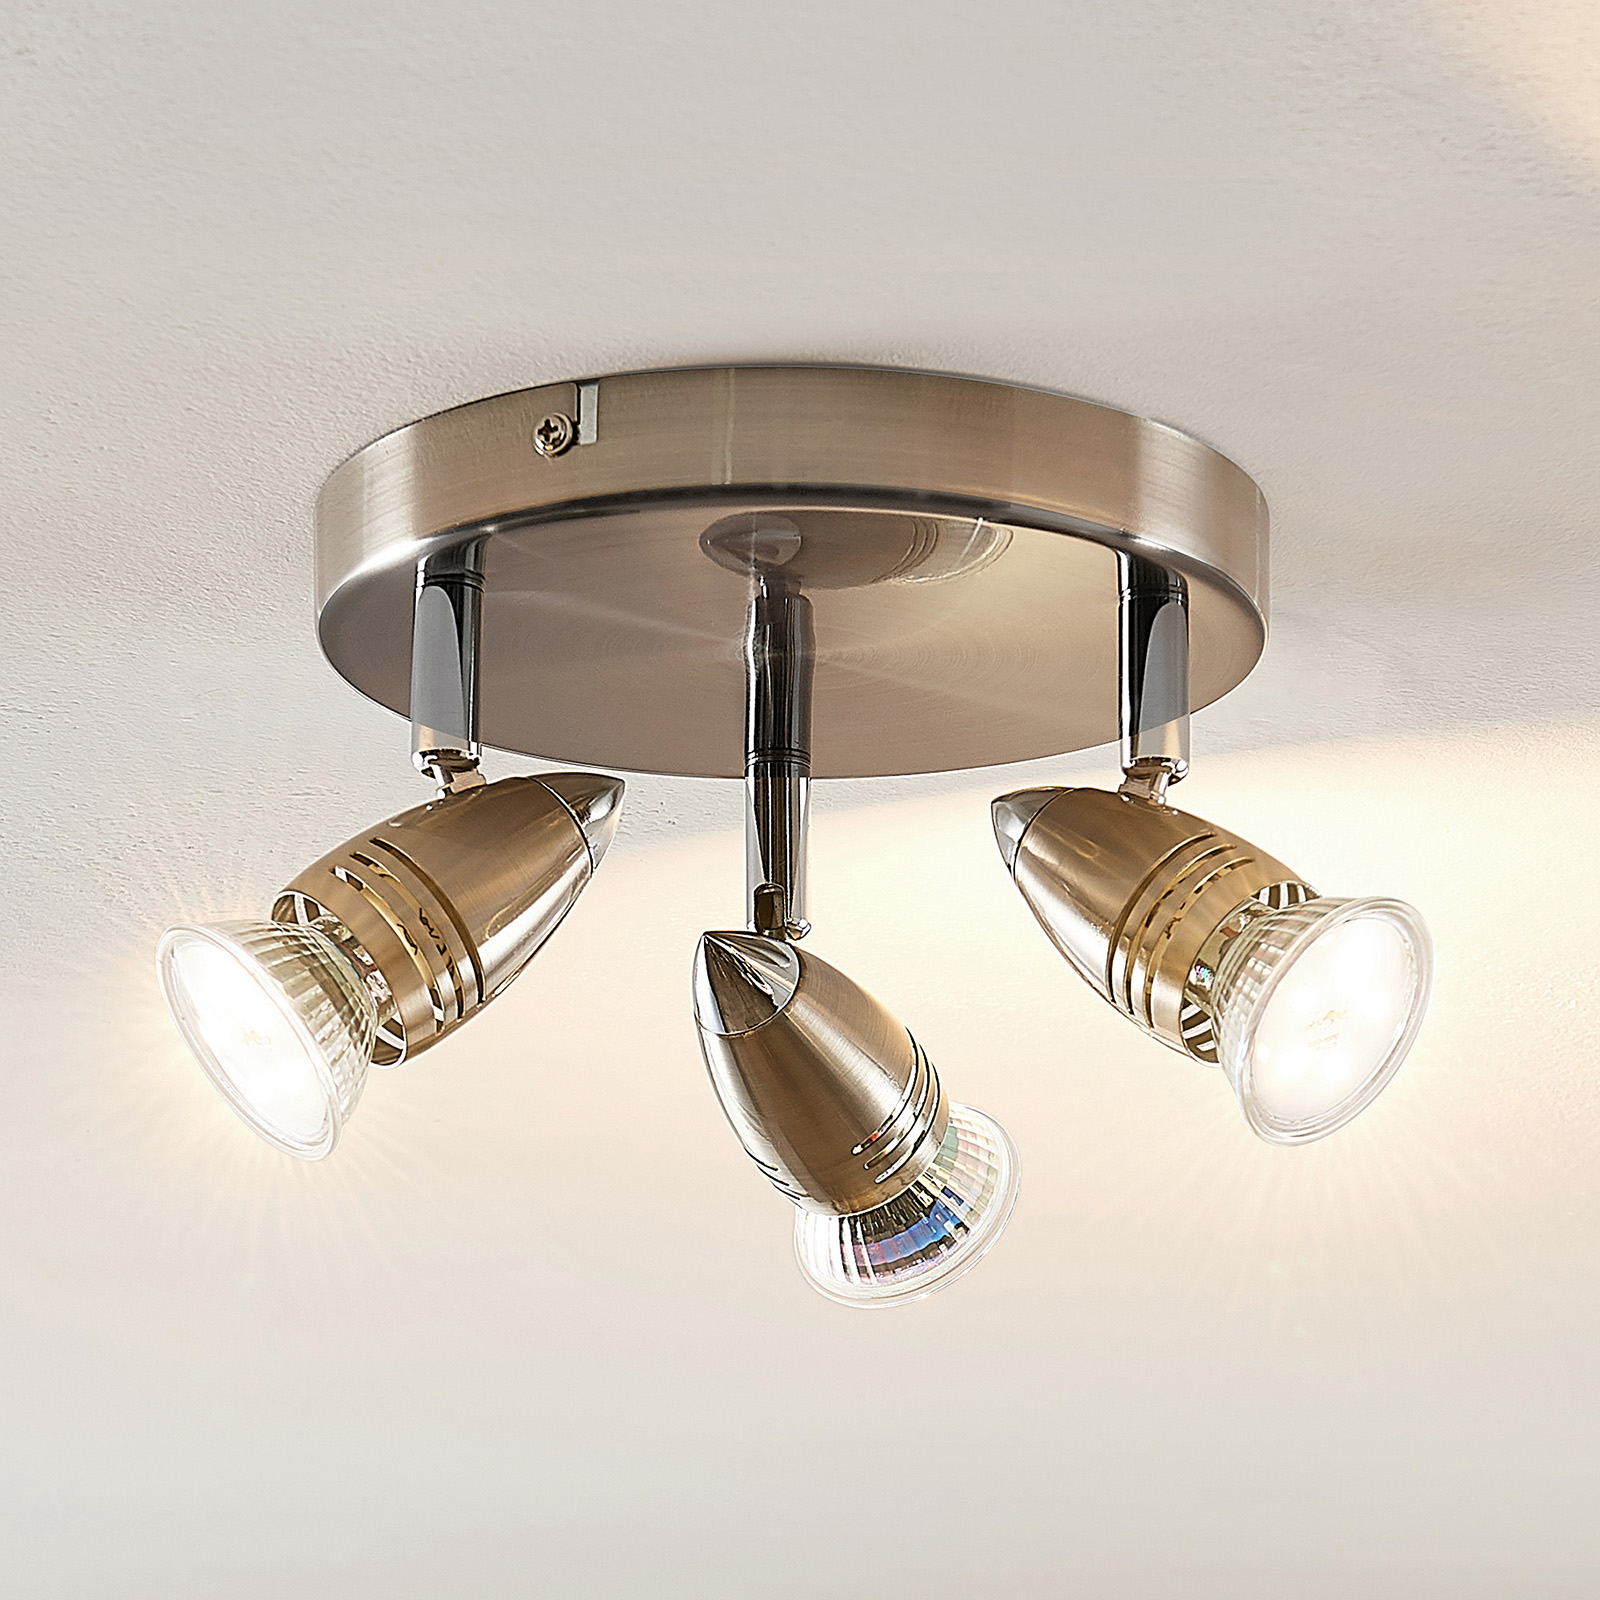 ELC Farida -LED-kohdevalo, nikkeli, 3-lamp.